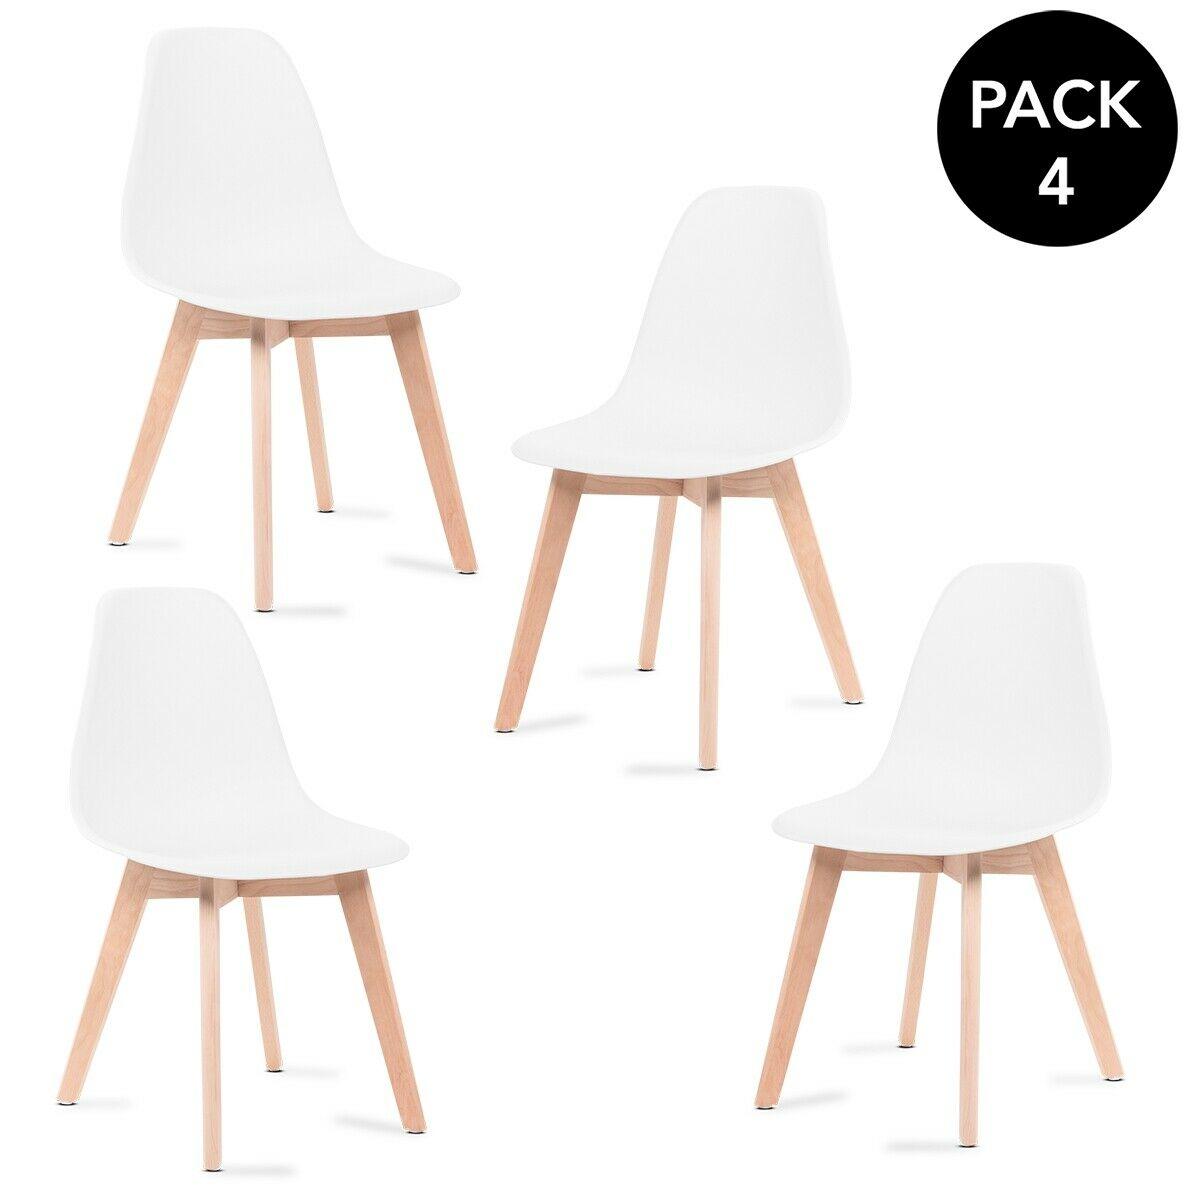 Pack 4 sillas nórdicas con patas en madera (o las Tower a 56,99€)